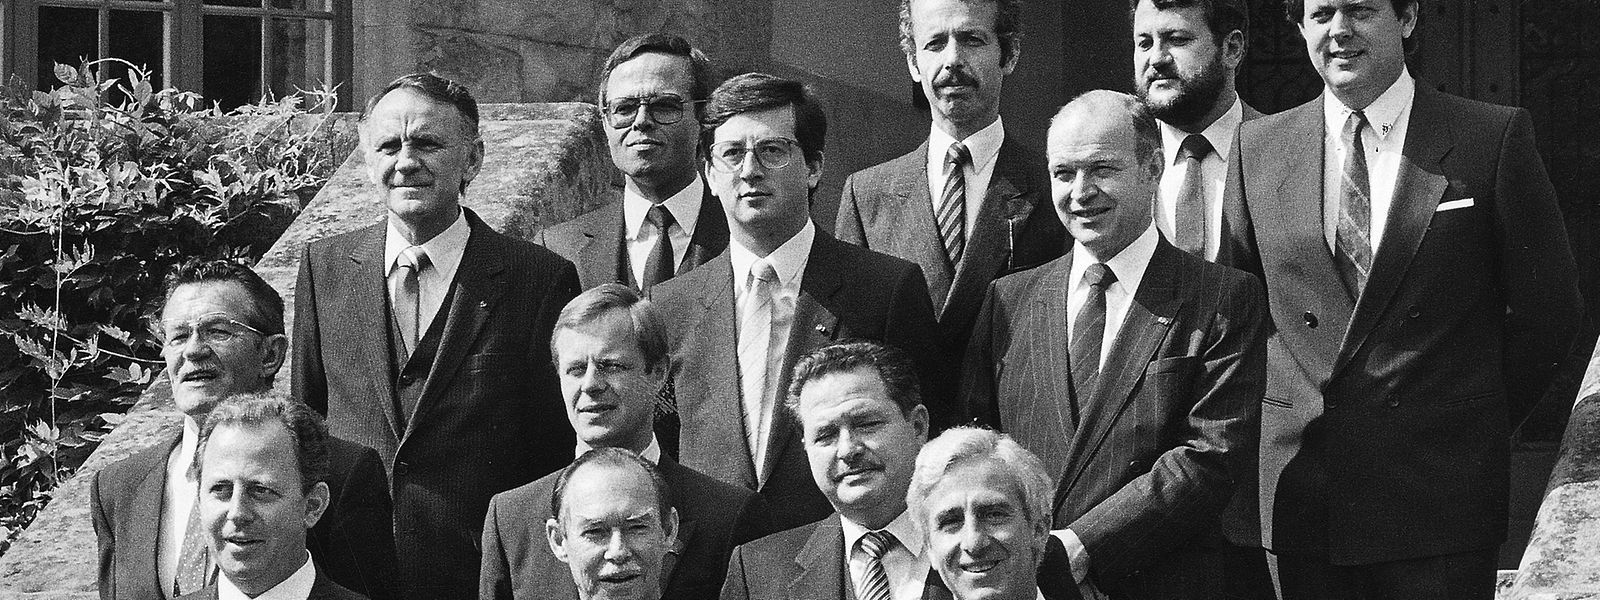 Das Kabinett Santer-Poos nach der Vereidigung: V.l.n.r. 1. R.: Jacques Santer, Großherzog Jean, Jacques Poos; 2. R.: Robert Krieps, Fernand Boden, Benny Berg; 3. R.: Marcel Schlechter, Jean-Claude Juncker, Jean Spautz; 4. R.: Johny Lahure, Marc Fischbach, Robert Goebbels, René Steichen.